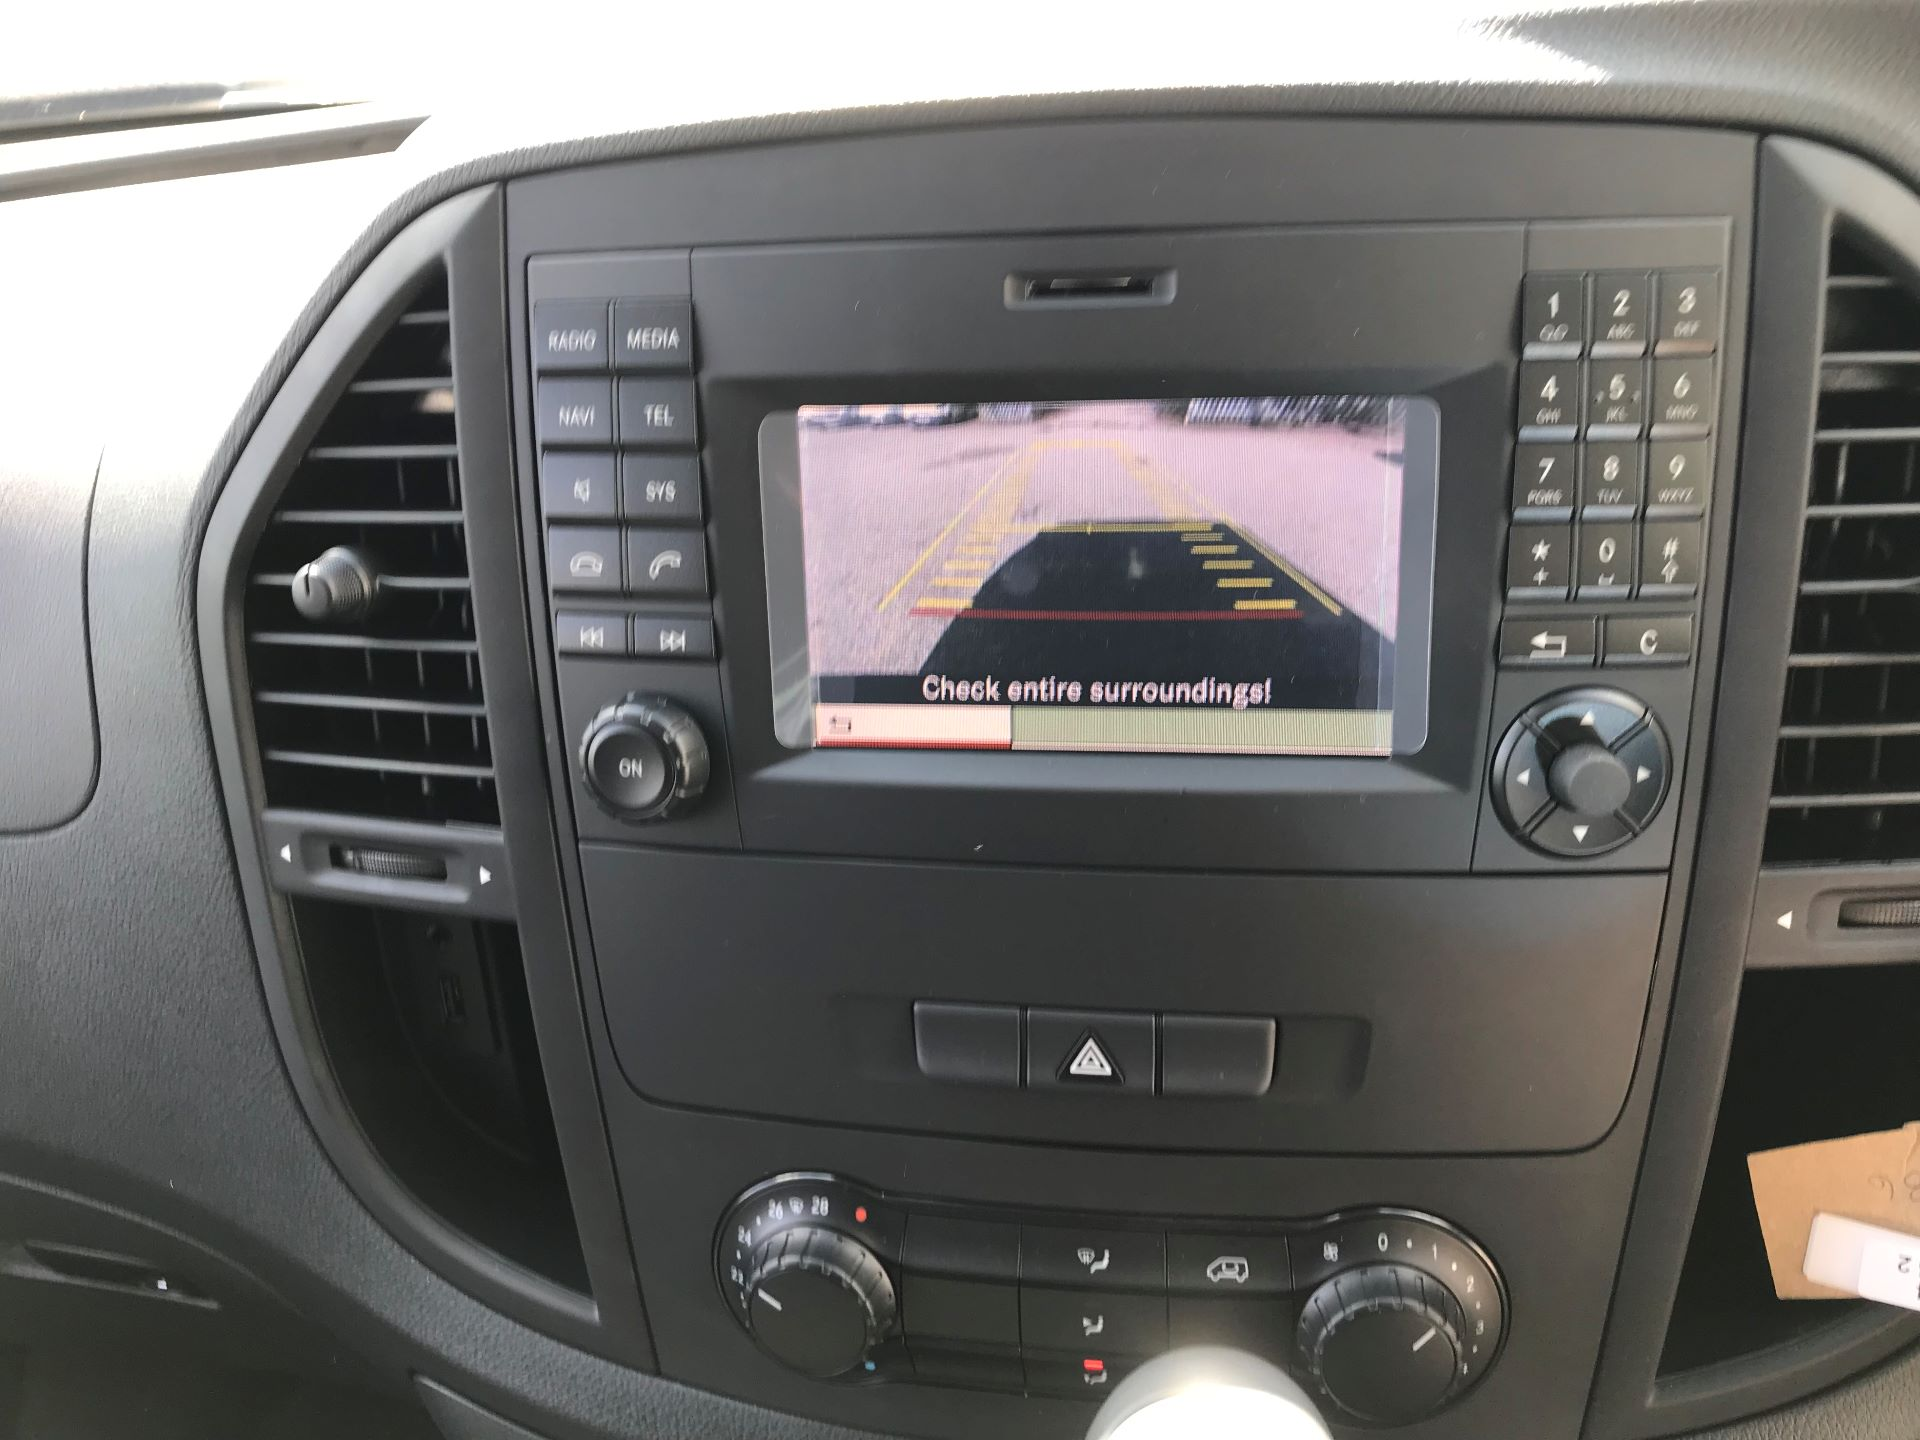 2019 Mercedes-Benz Vito 111Cdi Van Euro 6 Massive specification A/C (YM19FPU) Image 19